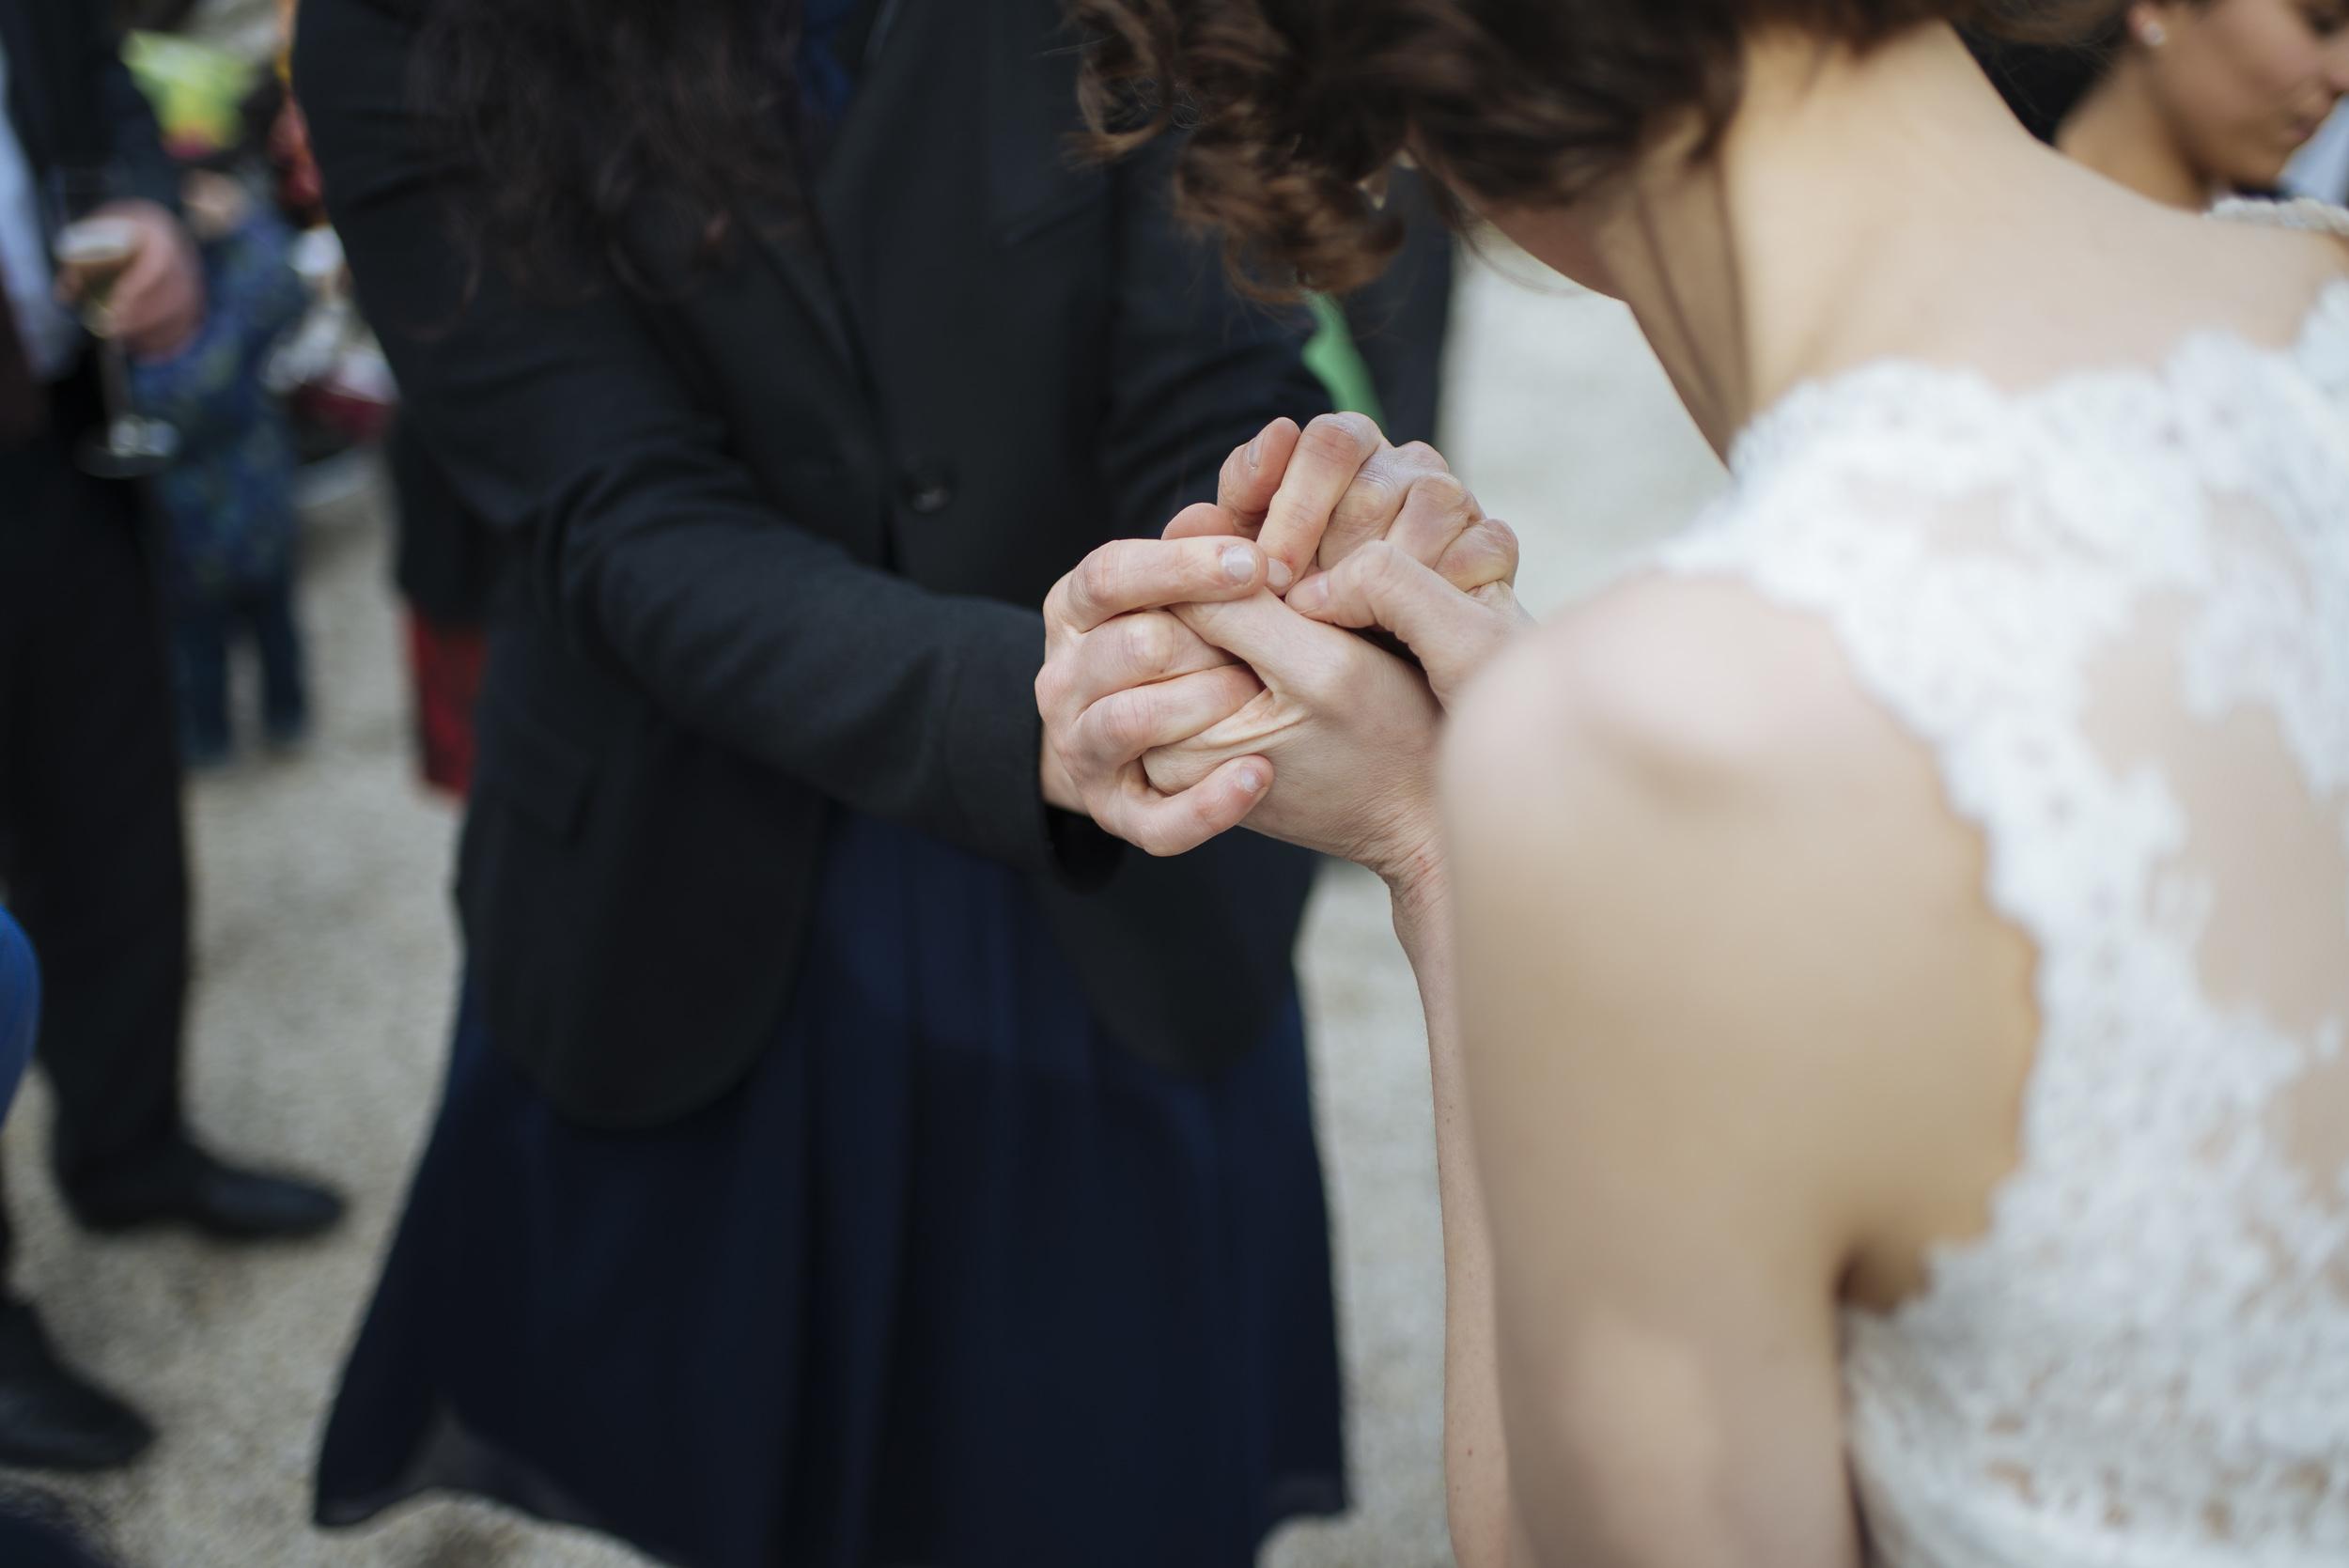 Hochzeitsfotograf-Schlossruine-Hertefeld-Weeze-095.jpg